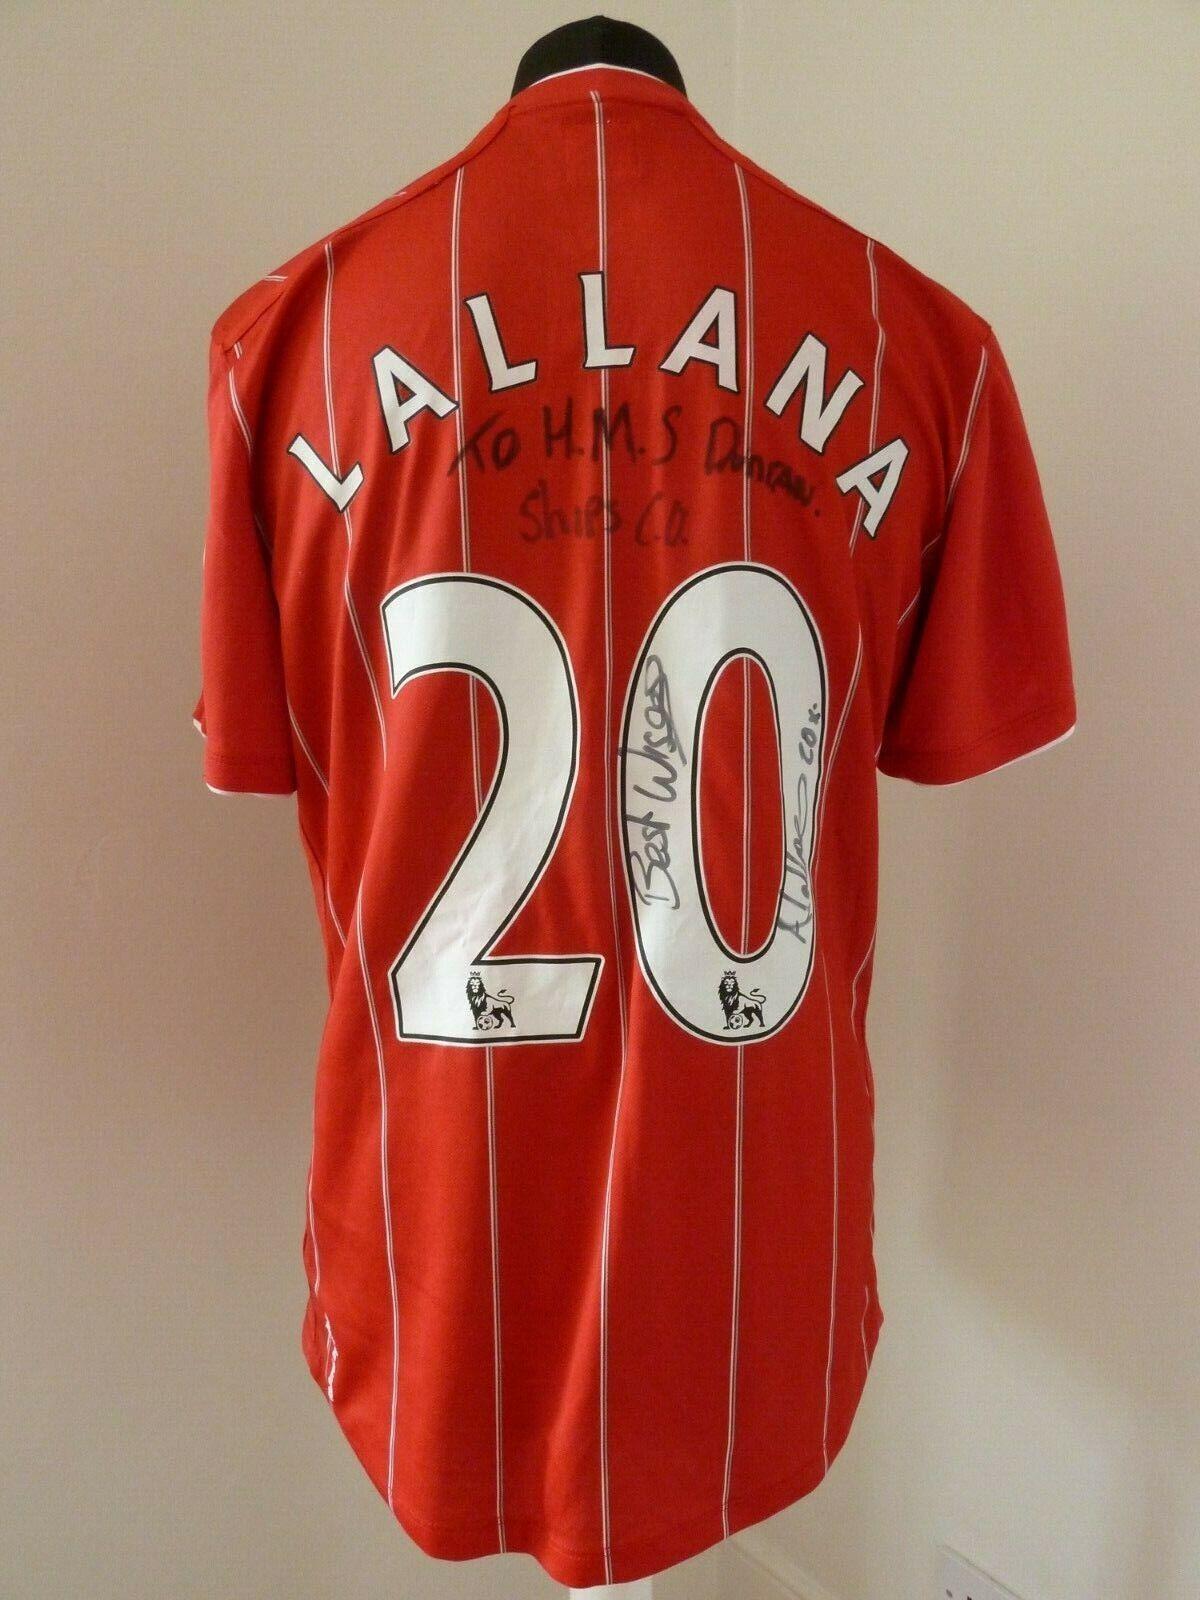 Genuine Matchworn + firmado Adam Lallana 20 Southampton FC Camiseta De Fútbol 2012 13